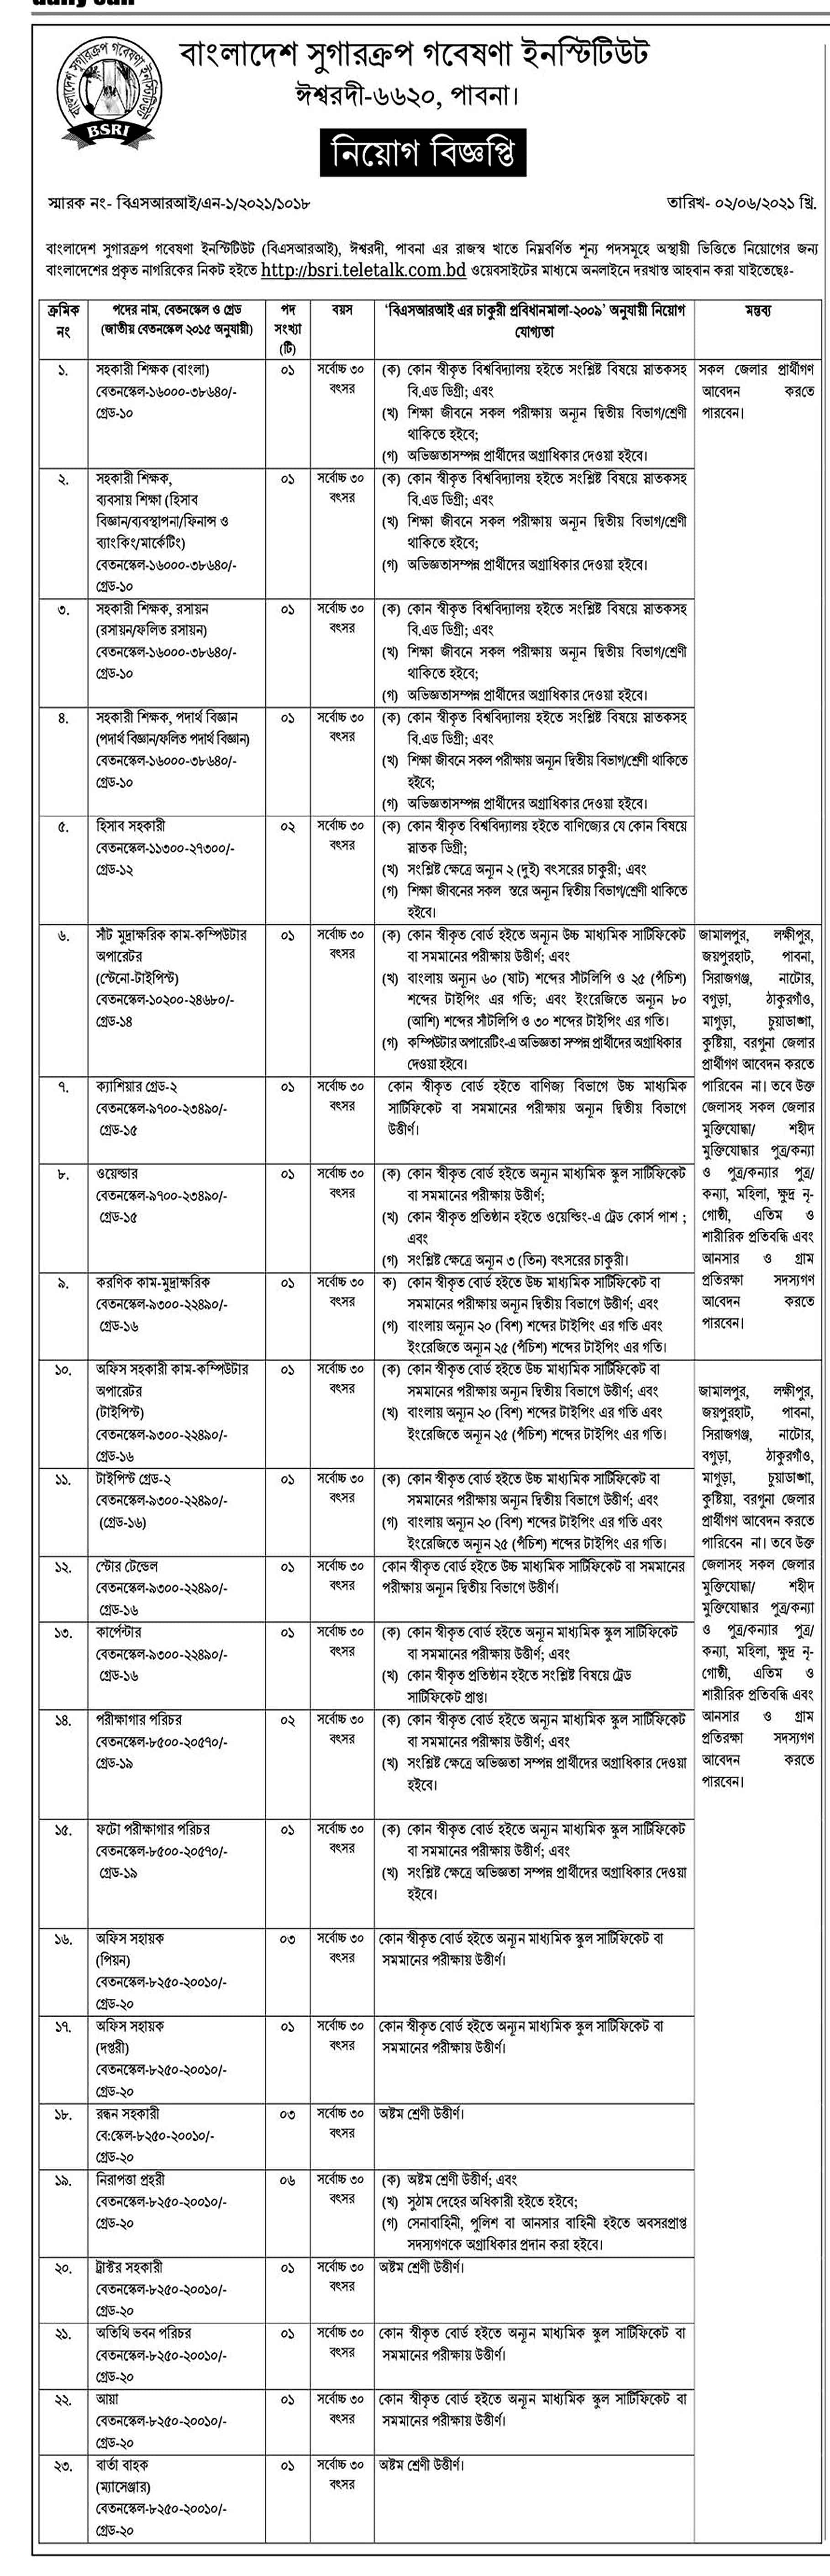 BSRI Job Circular 2021